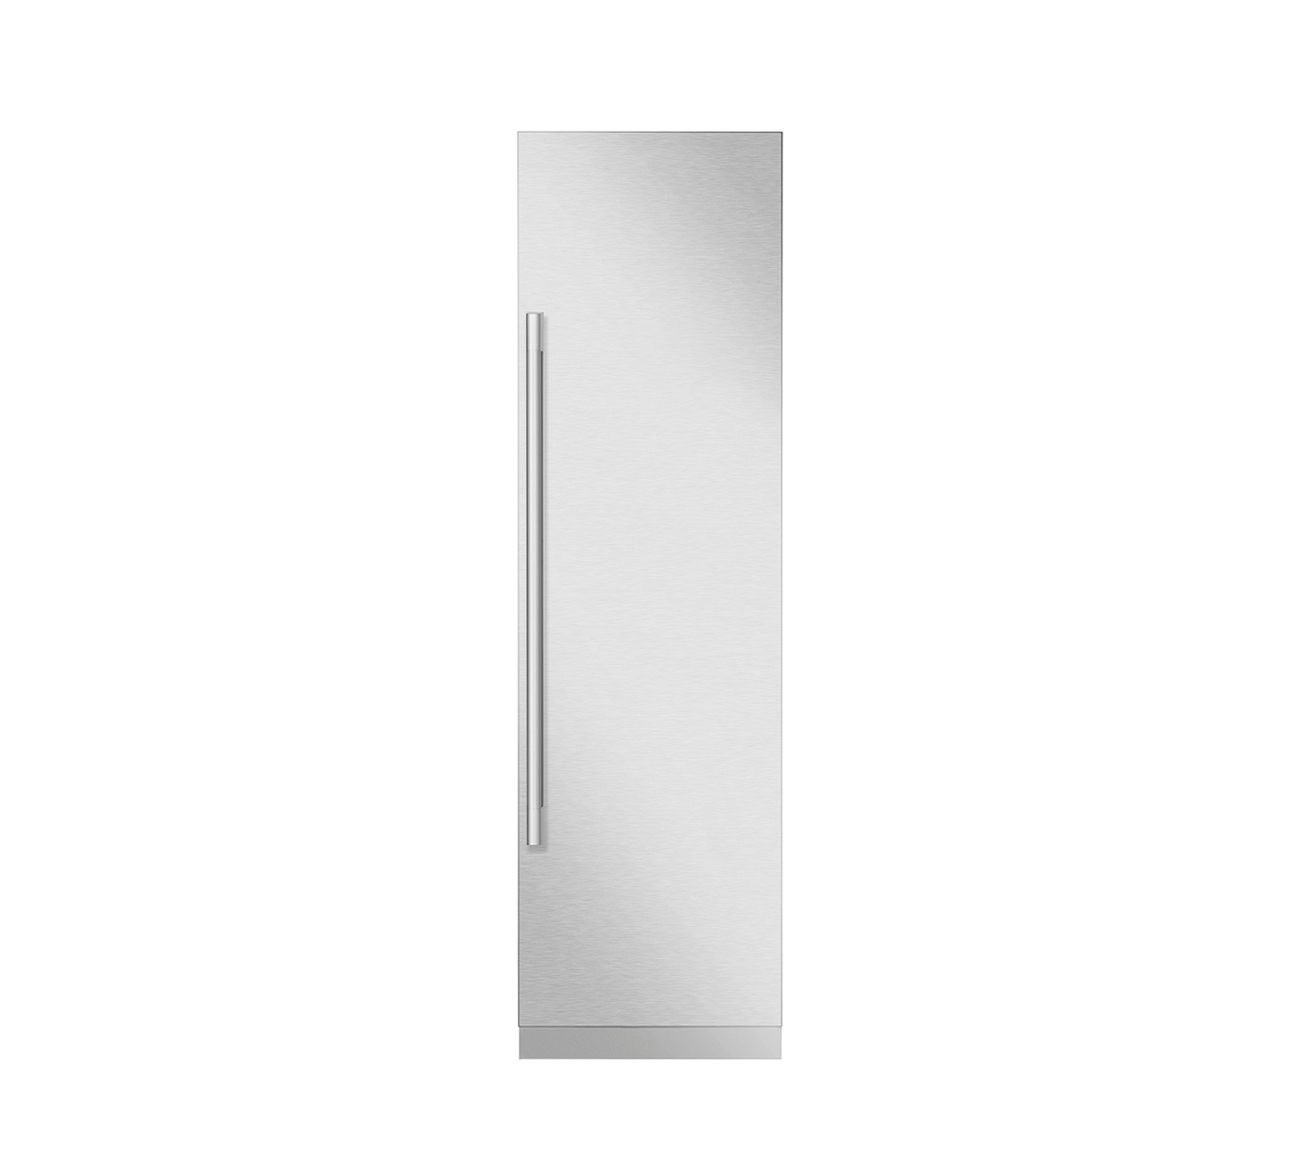 columnrefrigerators